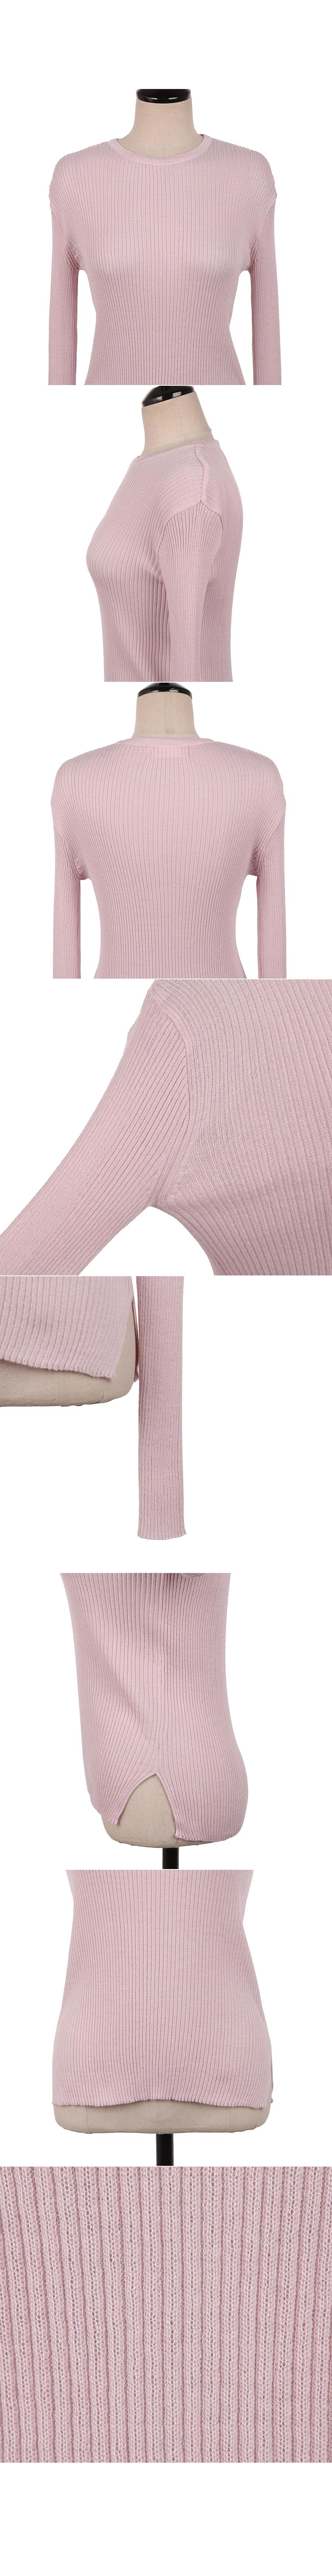 Ribbed spring knit pink